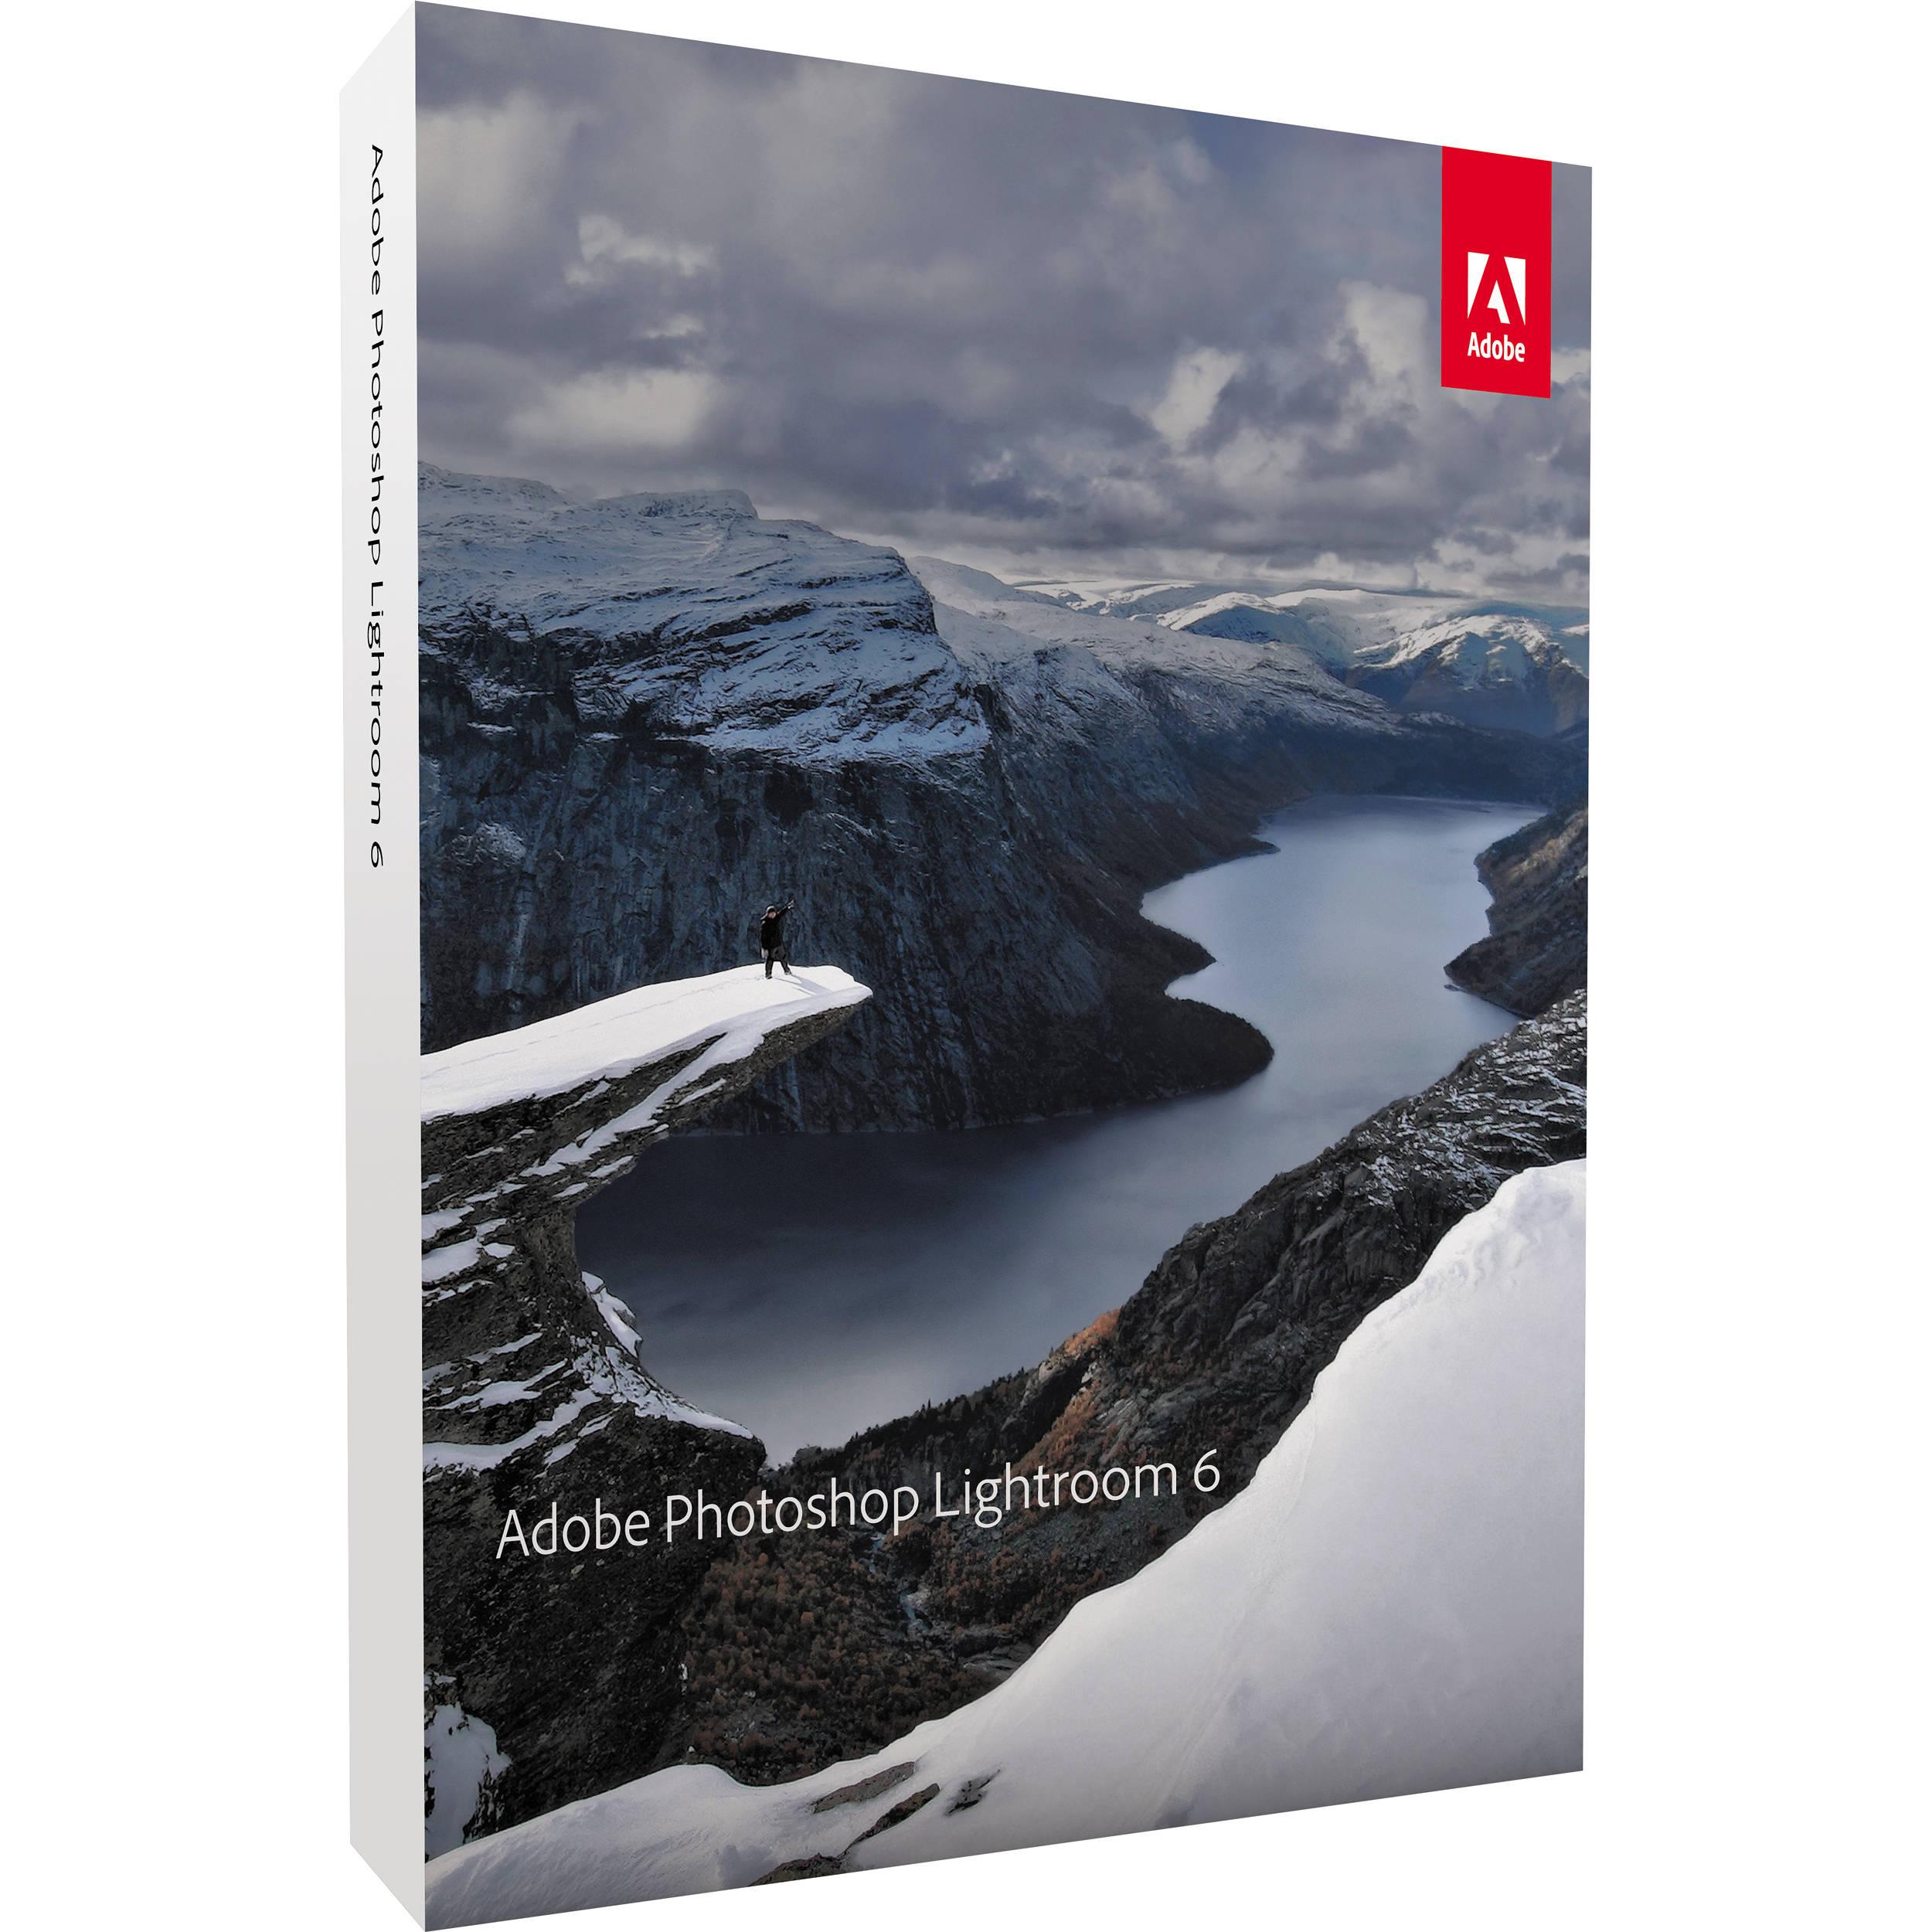 Adobe Photoshop Lightroom 6 (DVD) 65237578 B&H Photo Video